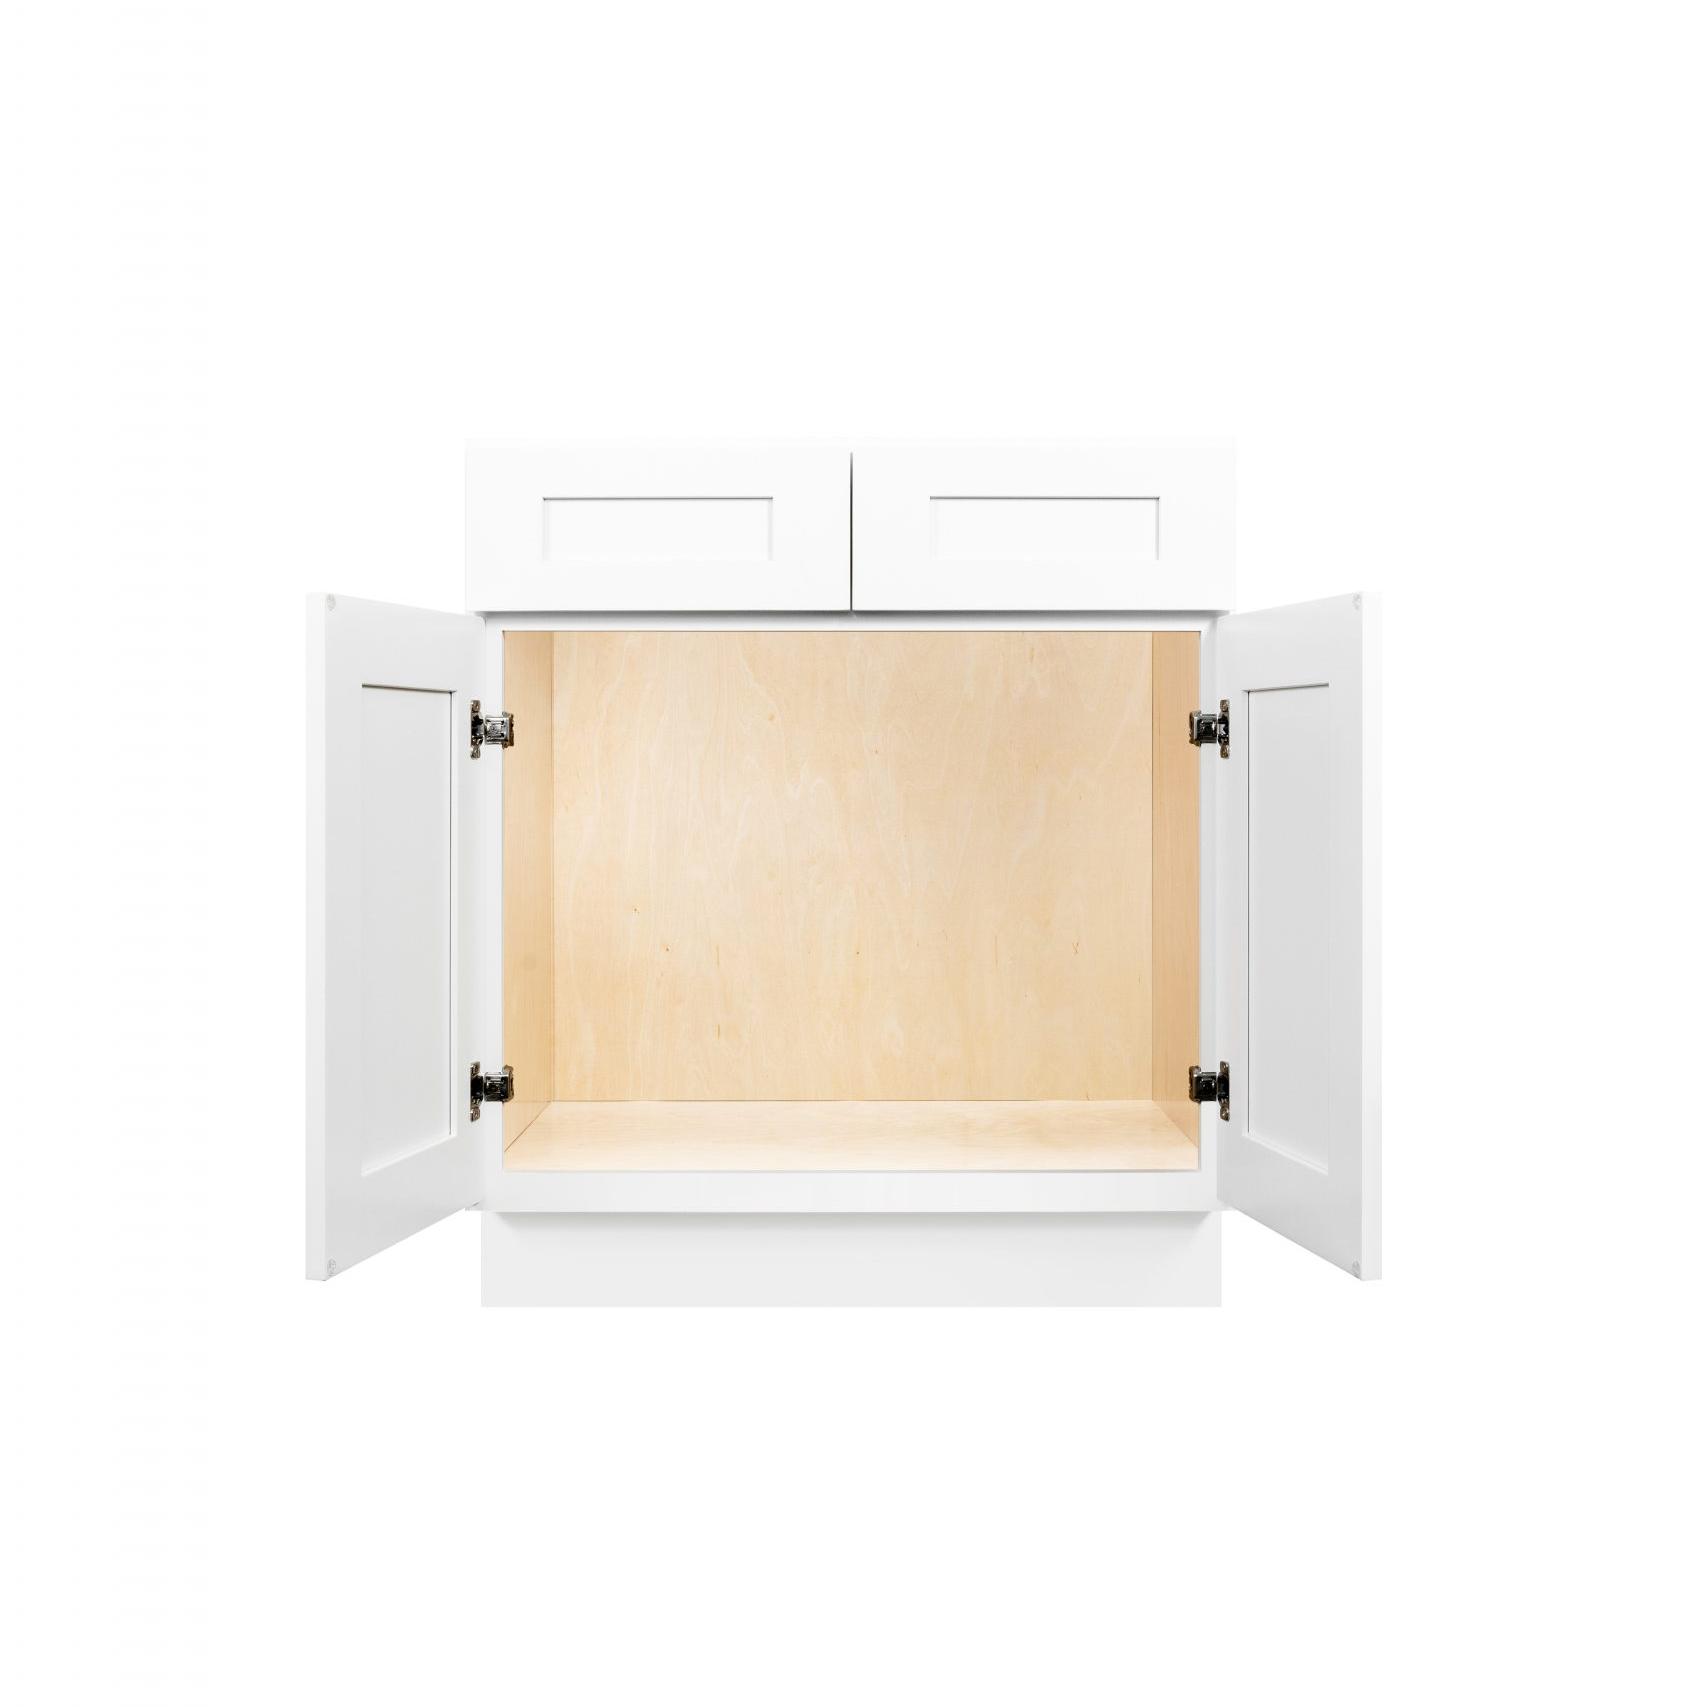 White Shaker Cabinetry SB30, SB33, SB36